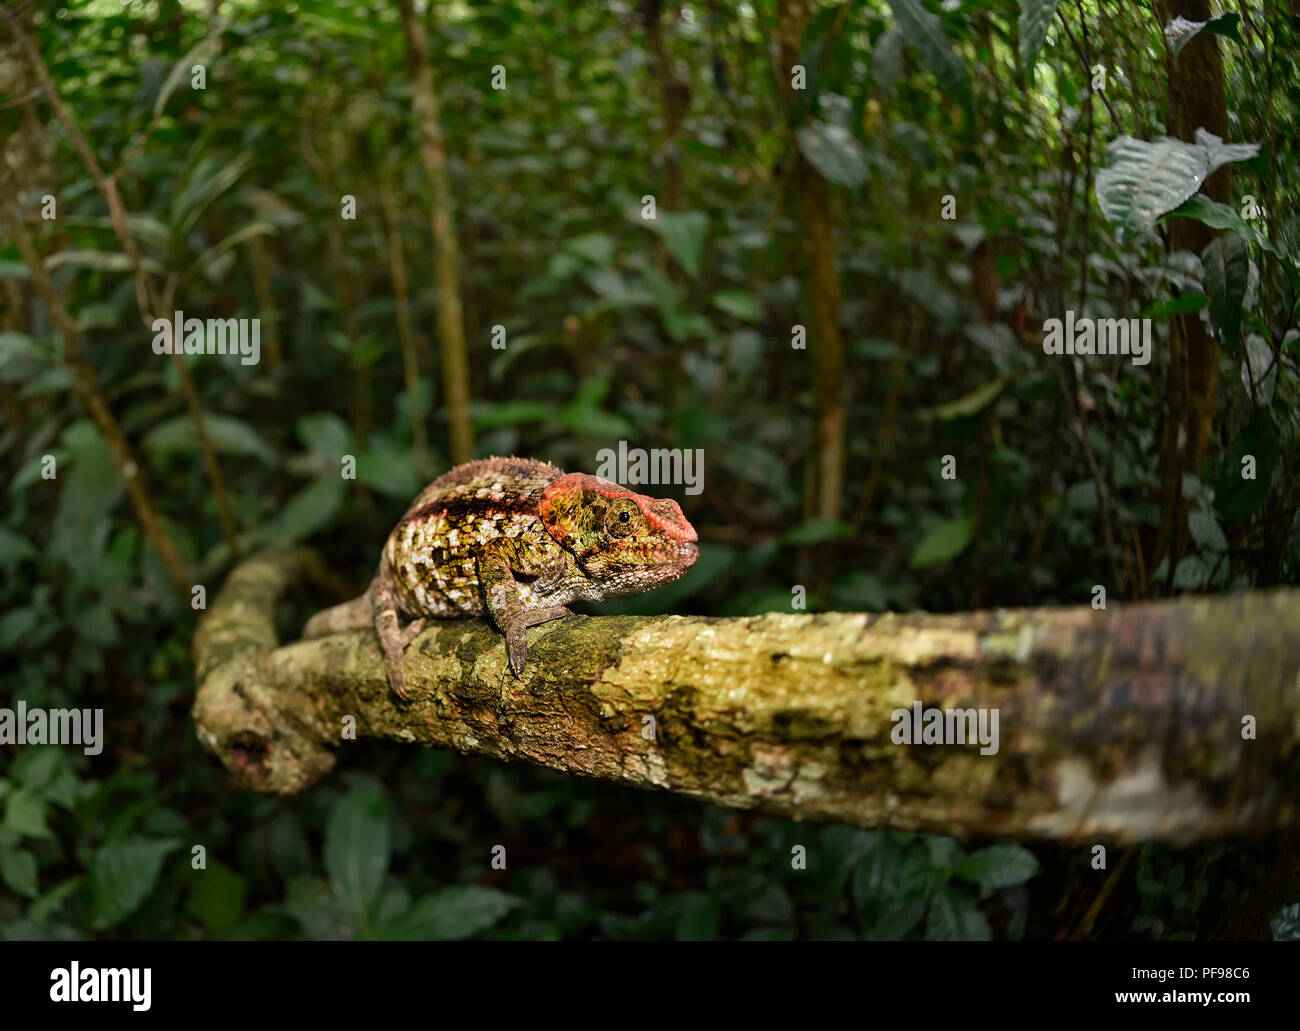 Curto-cornudo chameleon (Calumma brevicorne) no ramo, rainforest, Estados Unidos, Estados Unidos Imagens de Stock